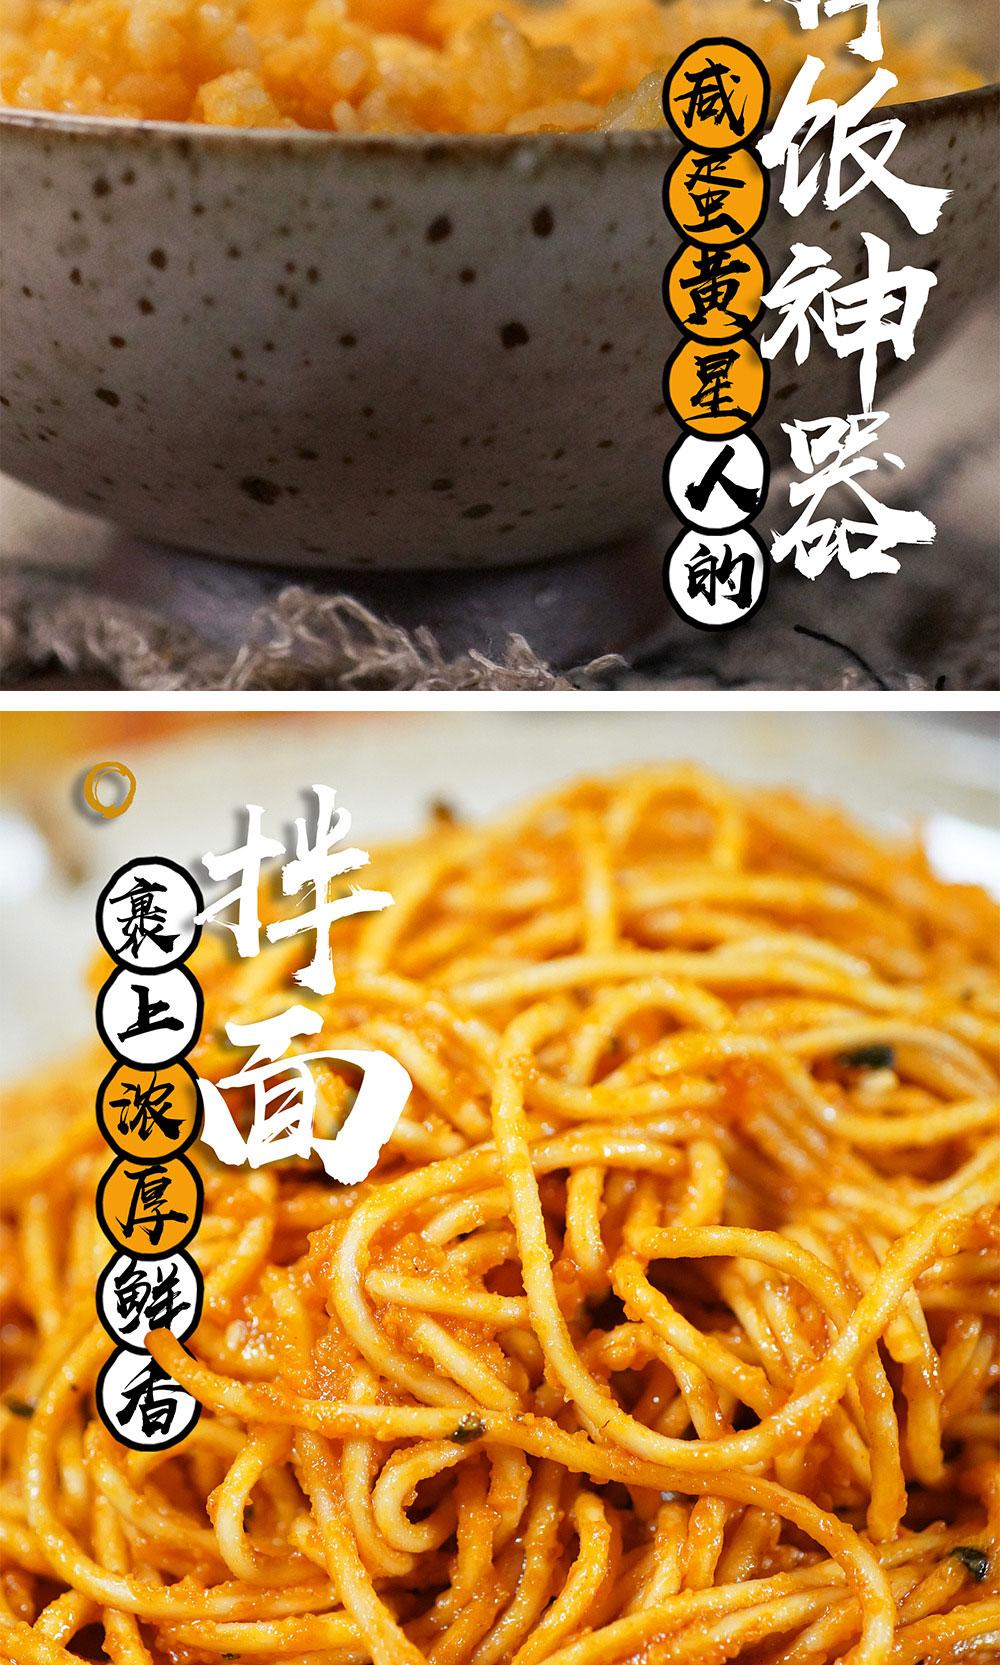 product_奇妙_一顿拌咸蛋黄酱